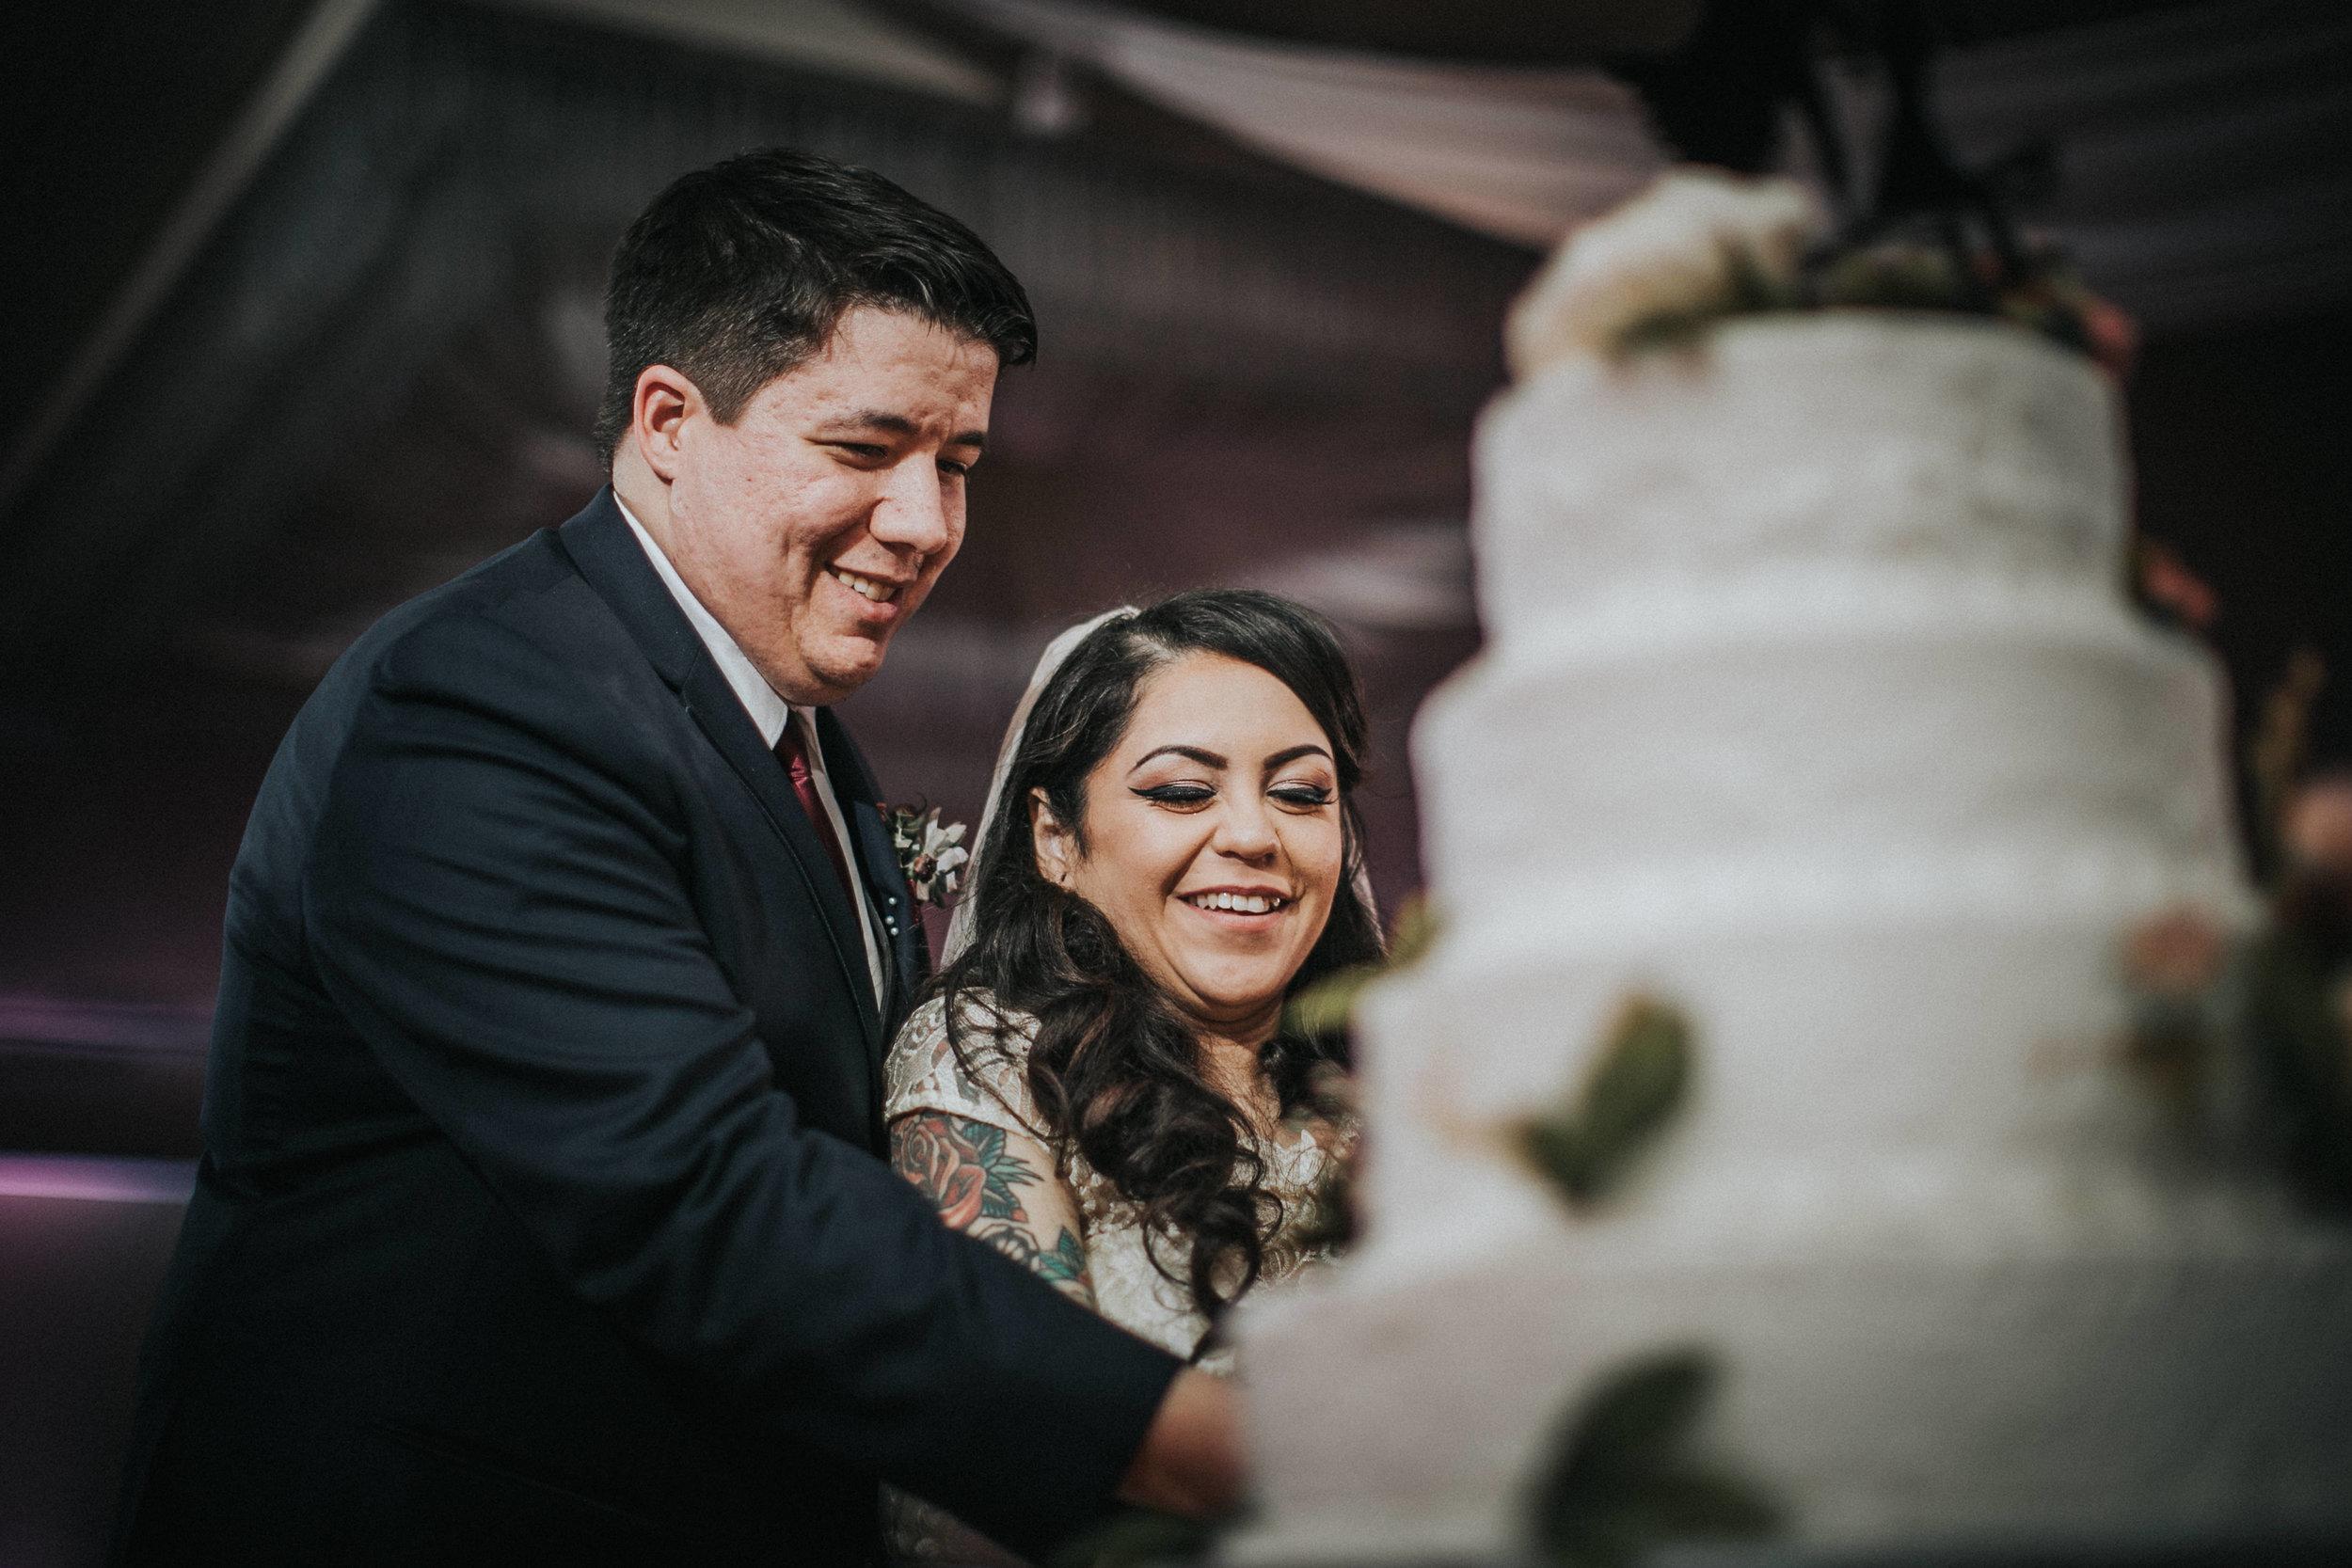 New-Jersey-Wedding-Photographer-ReceptionCenter-Valeria&Mike-Reception (125 of 265).jpg